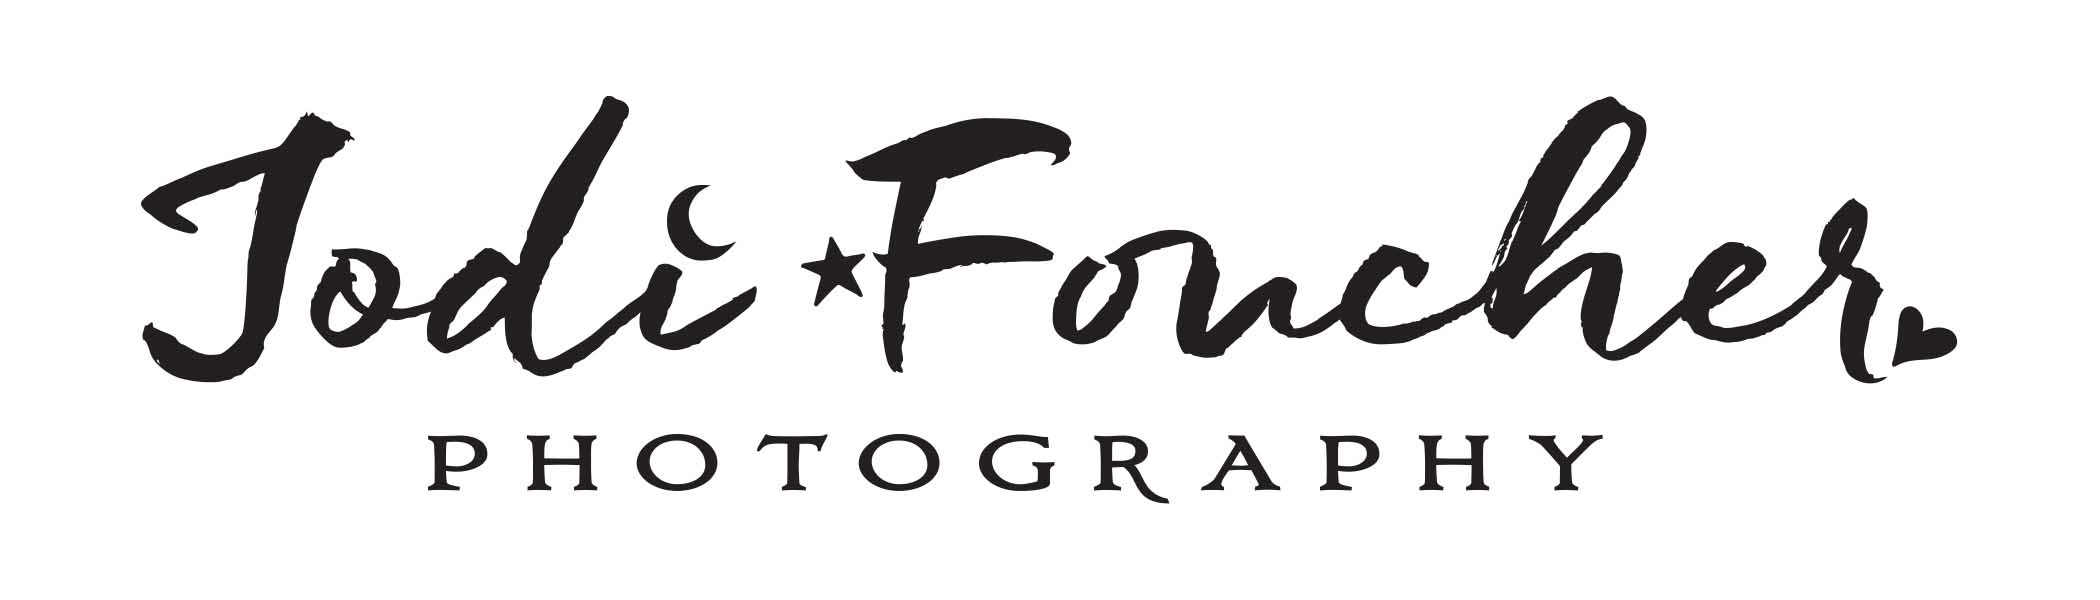 Jodi Foucher Photography